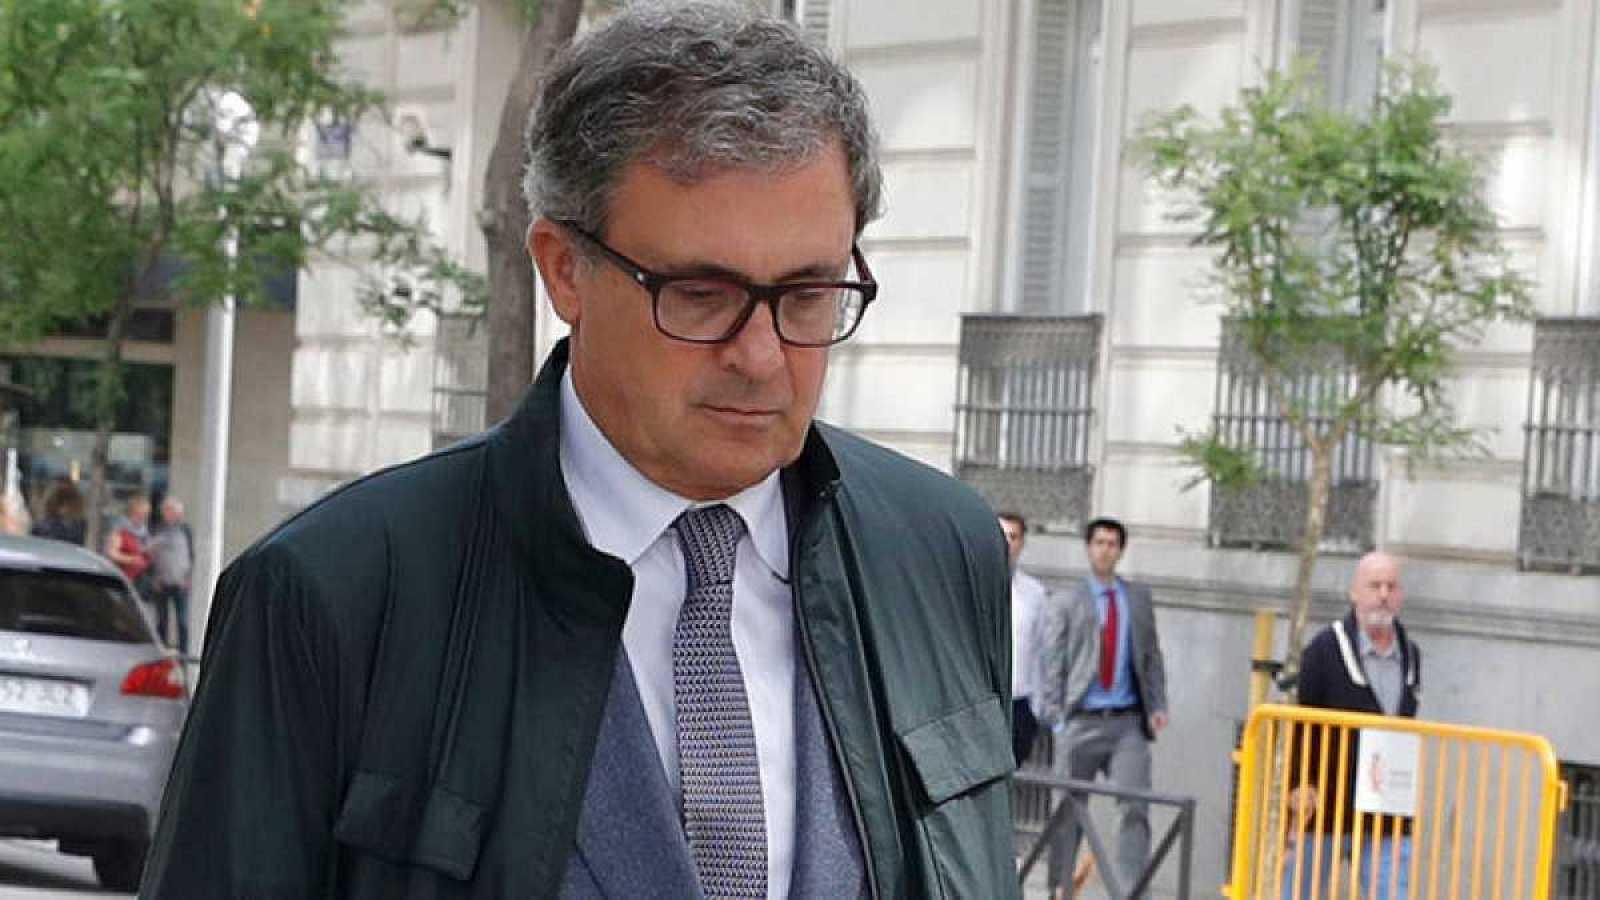 Boletines RNE - De La Mata propone juzgar a Convergència y al PDeCAT por el caso del 3% - Escuchar ahora